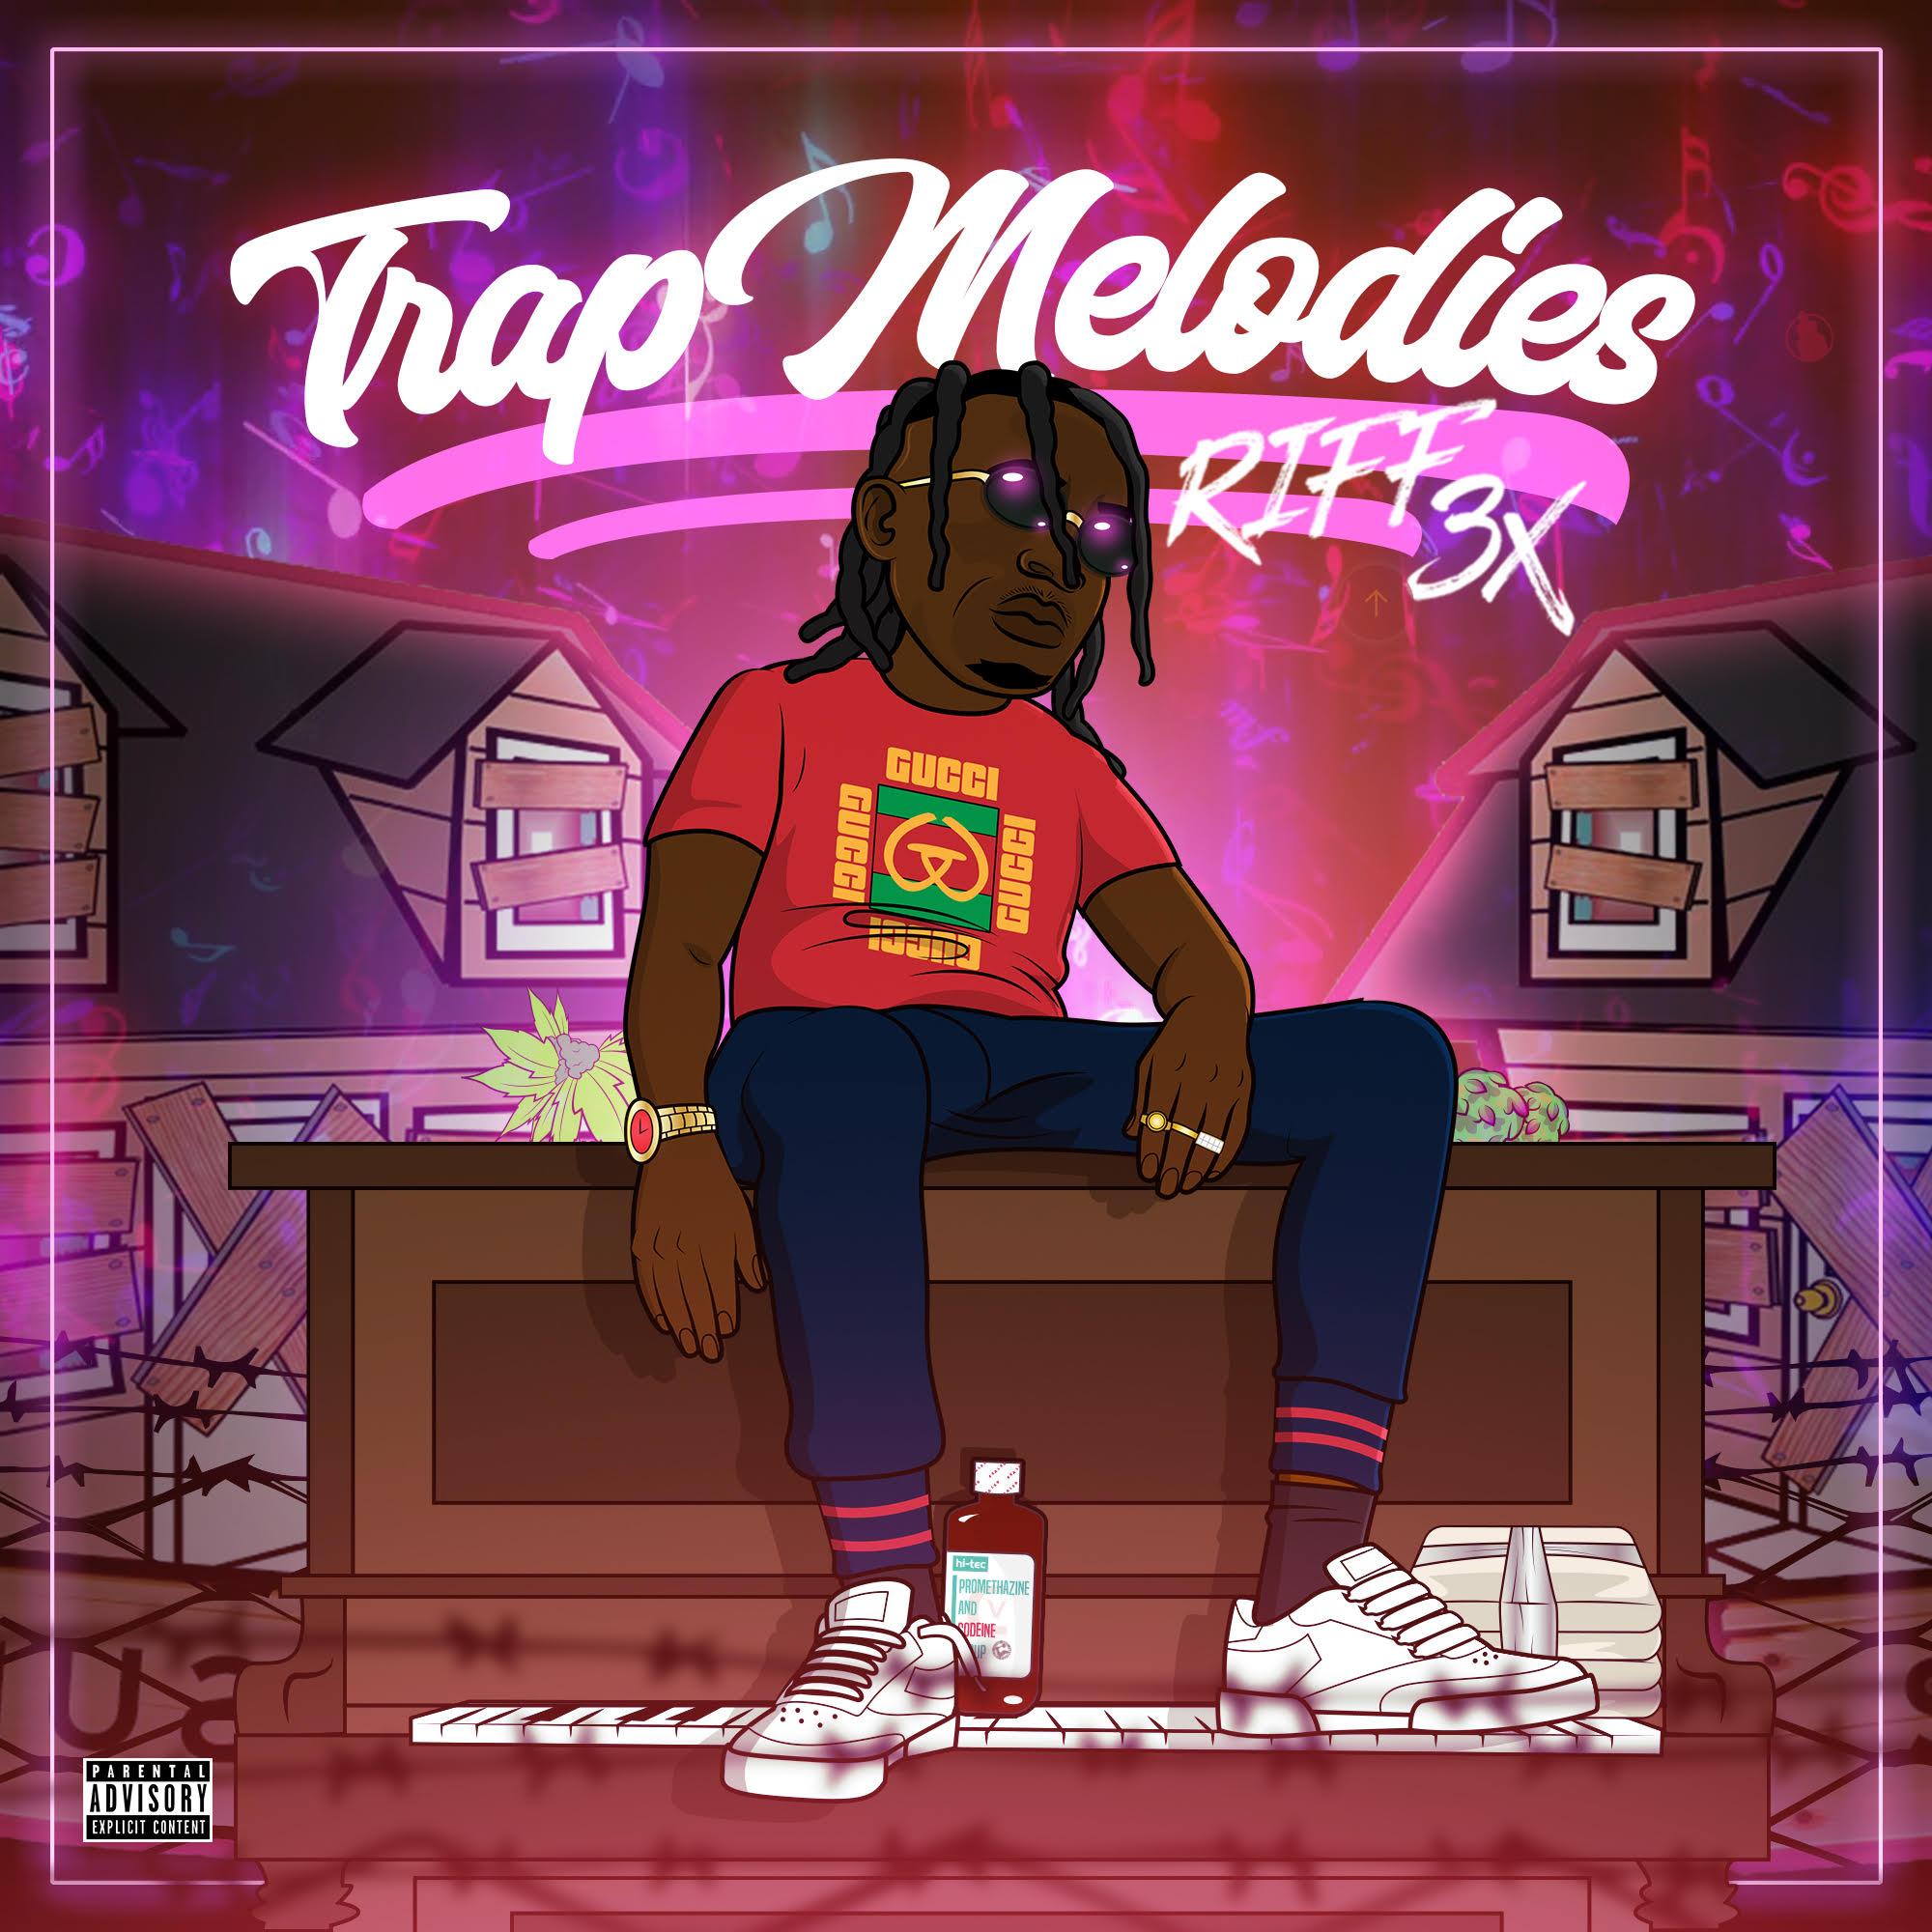 Riff 3x - Trap Melodies Cover Art